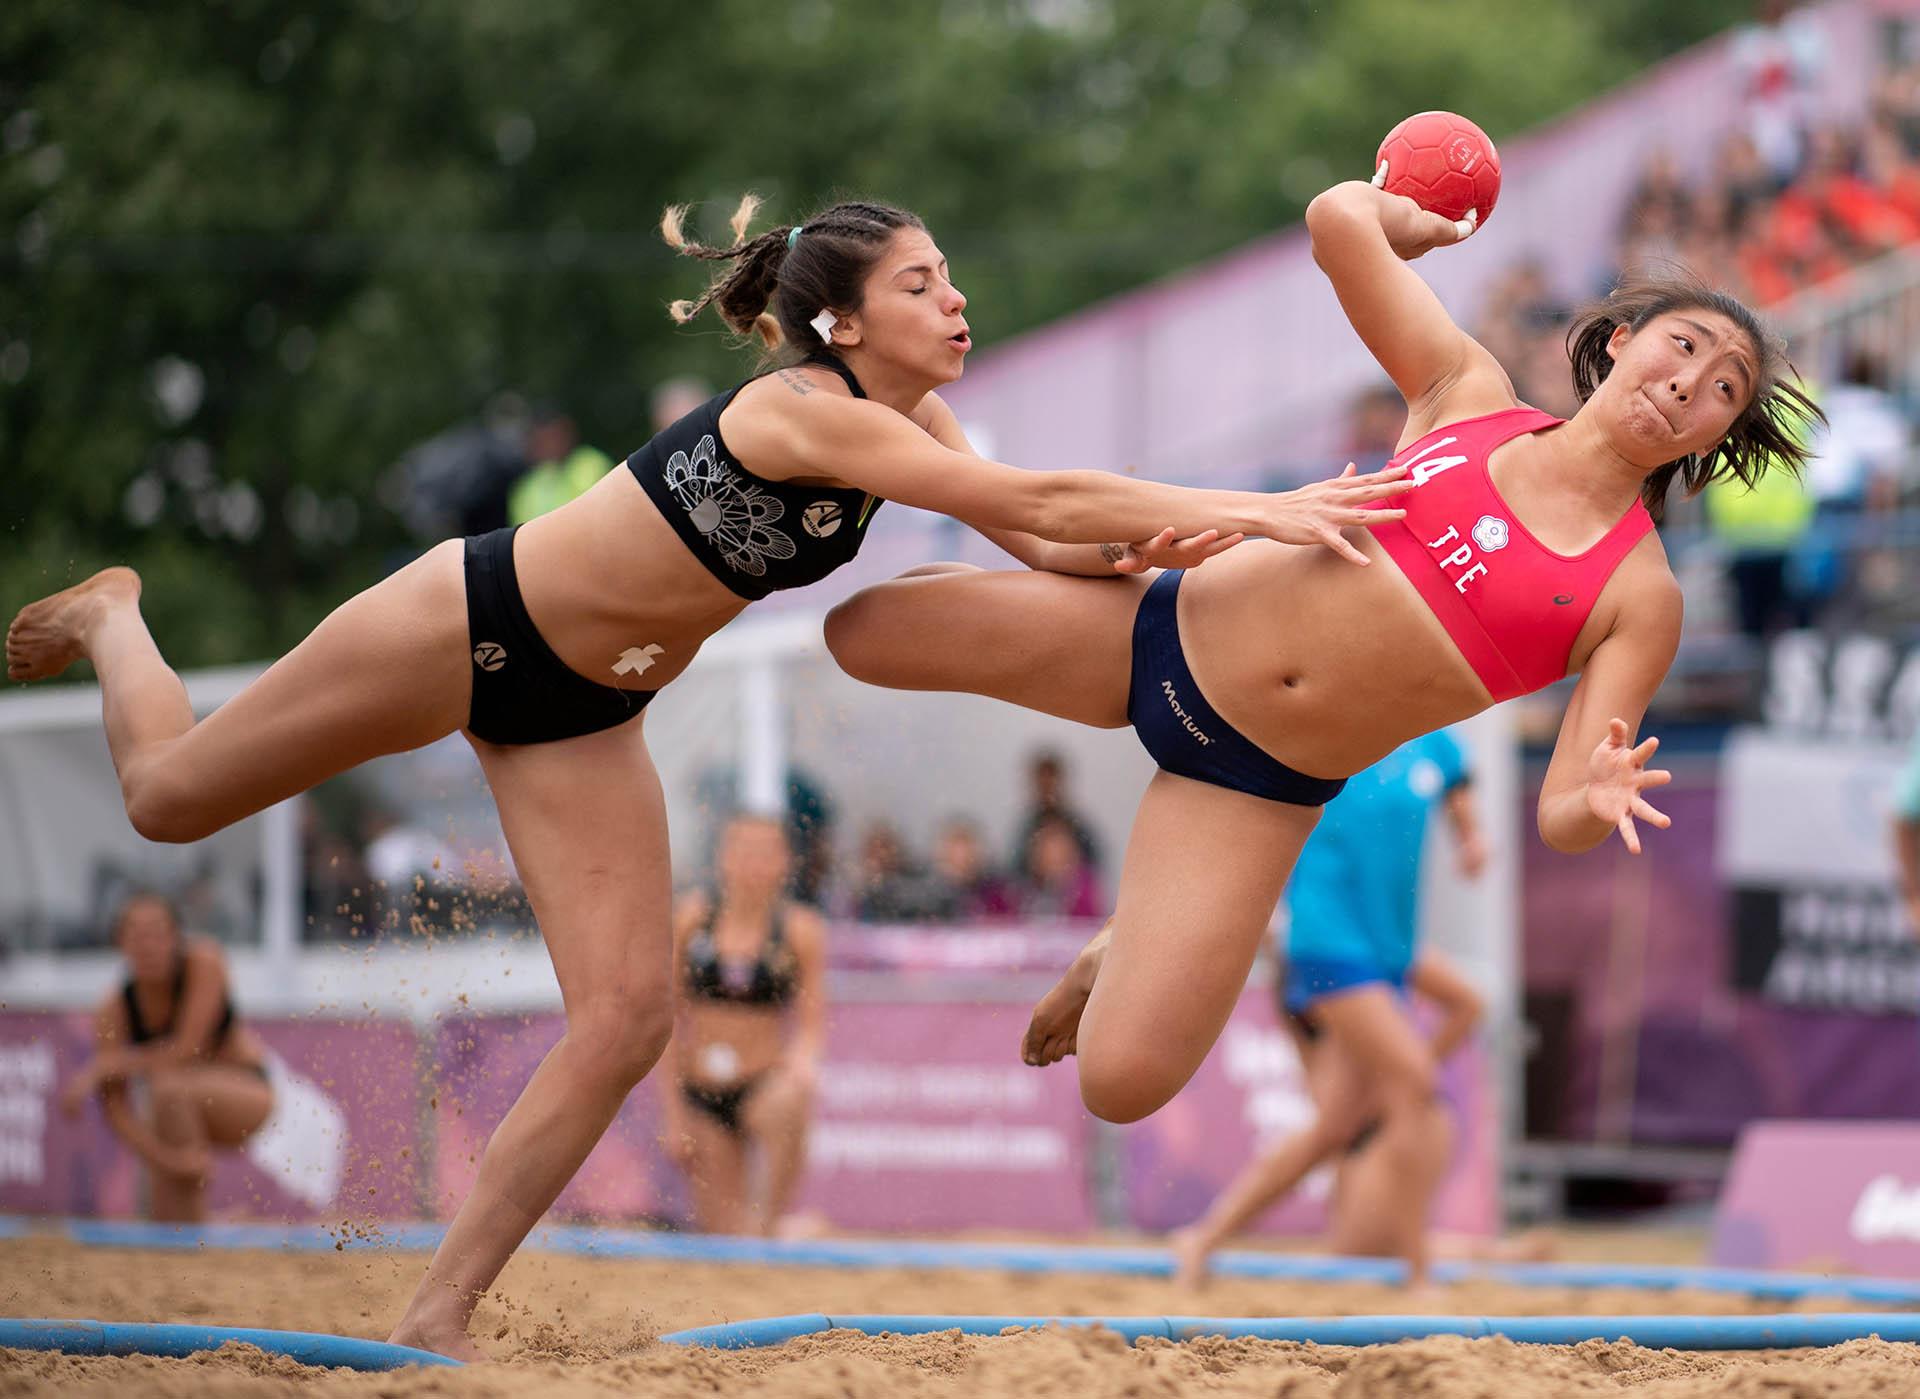 La figura de China Taipei, Yuchen Chao, a punto de convertir frente a Paraguay en beach handball (Foto: REUTERS)